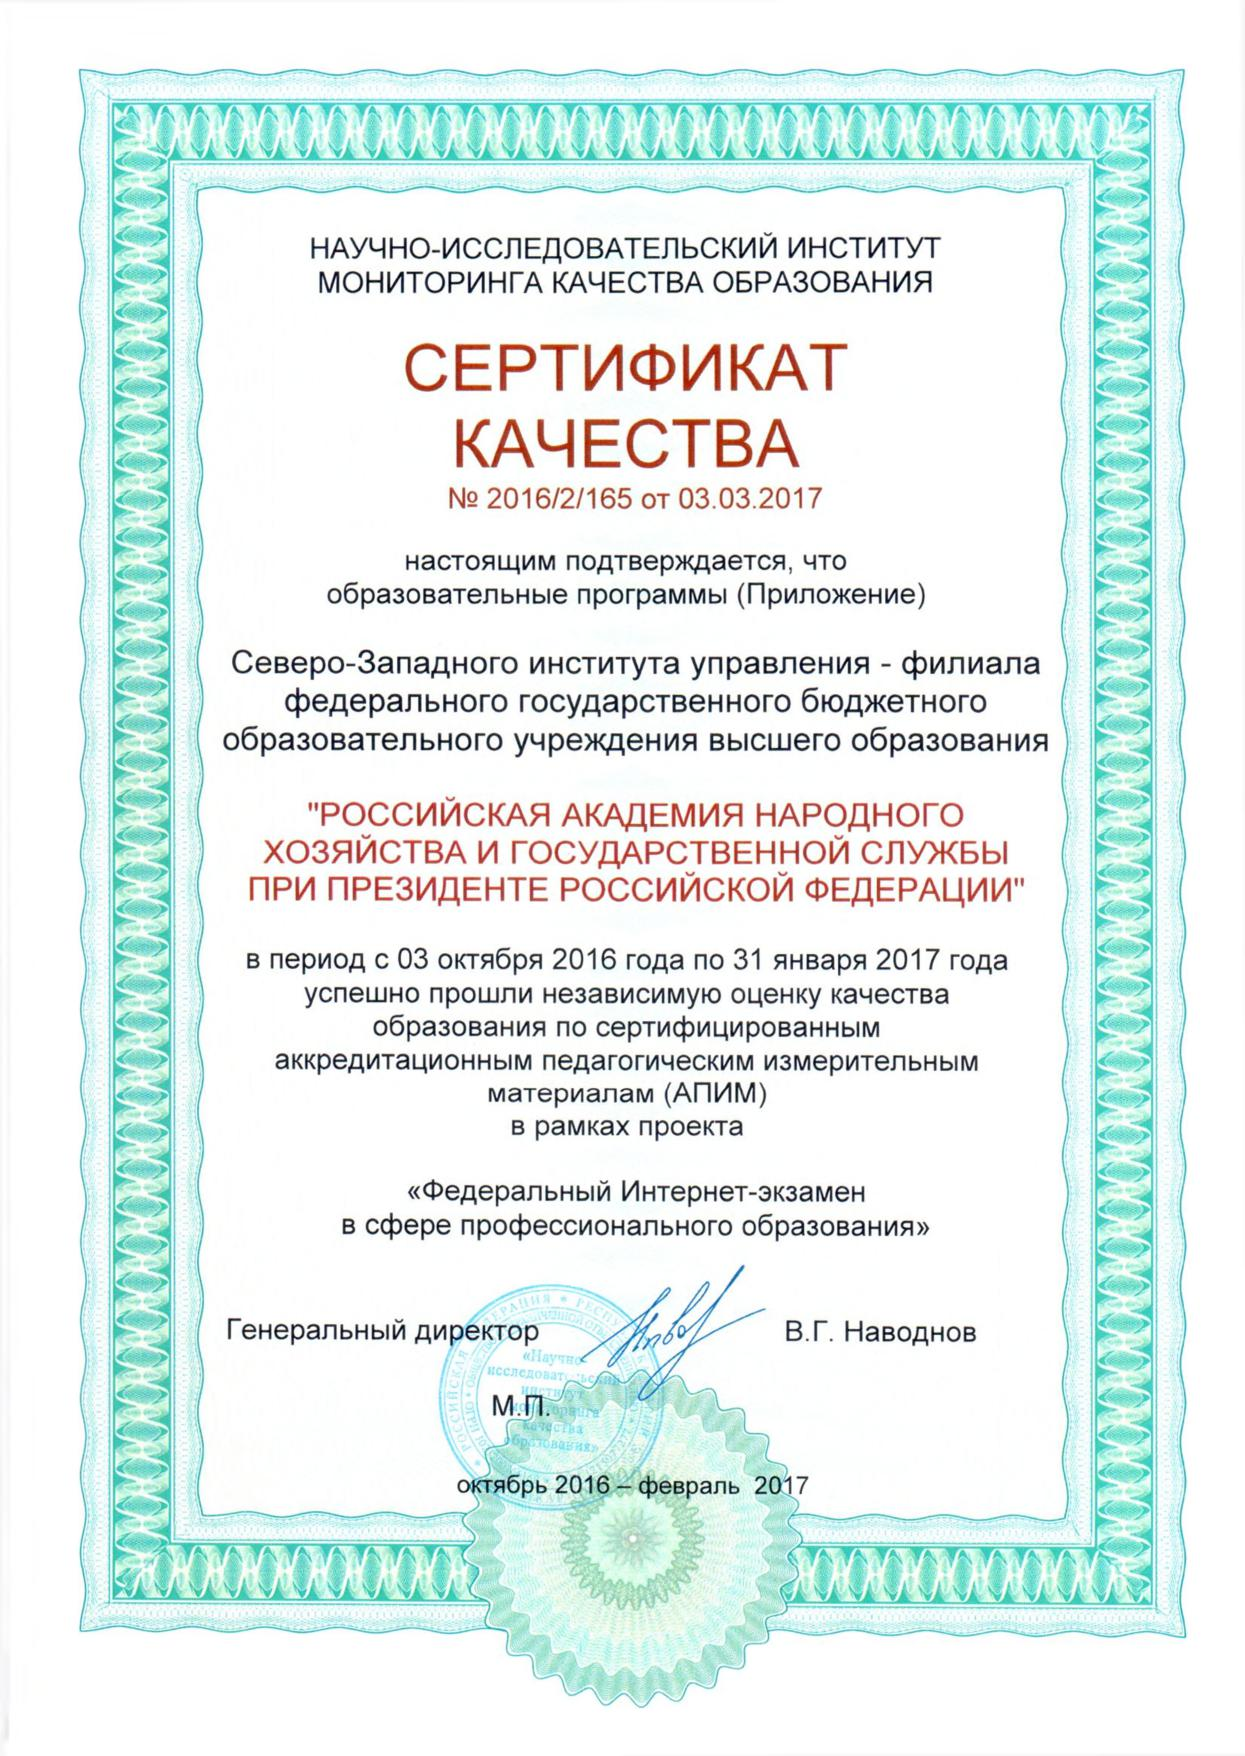 sertificat kachestva 2016 2